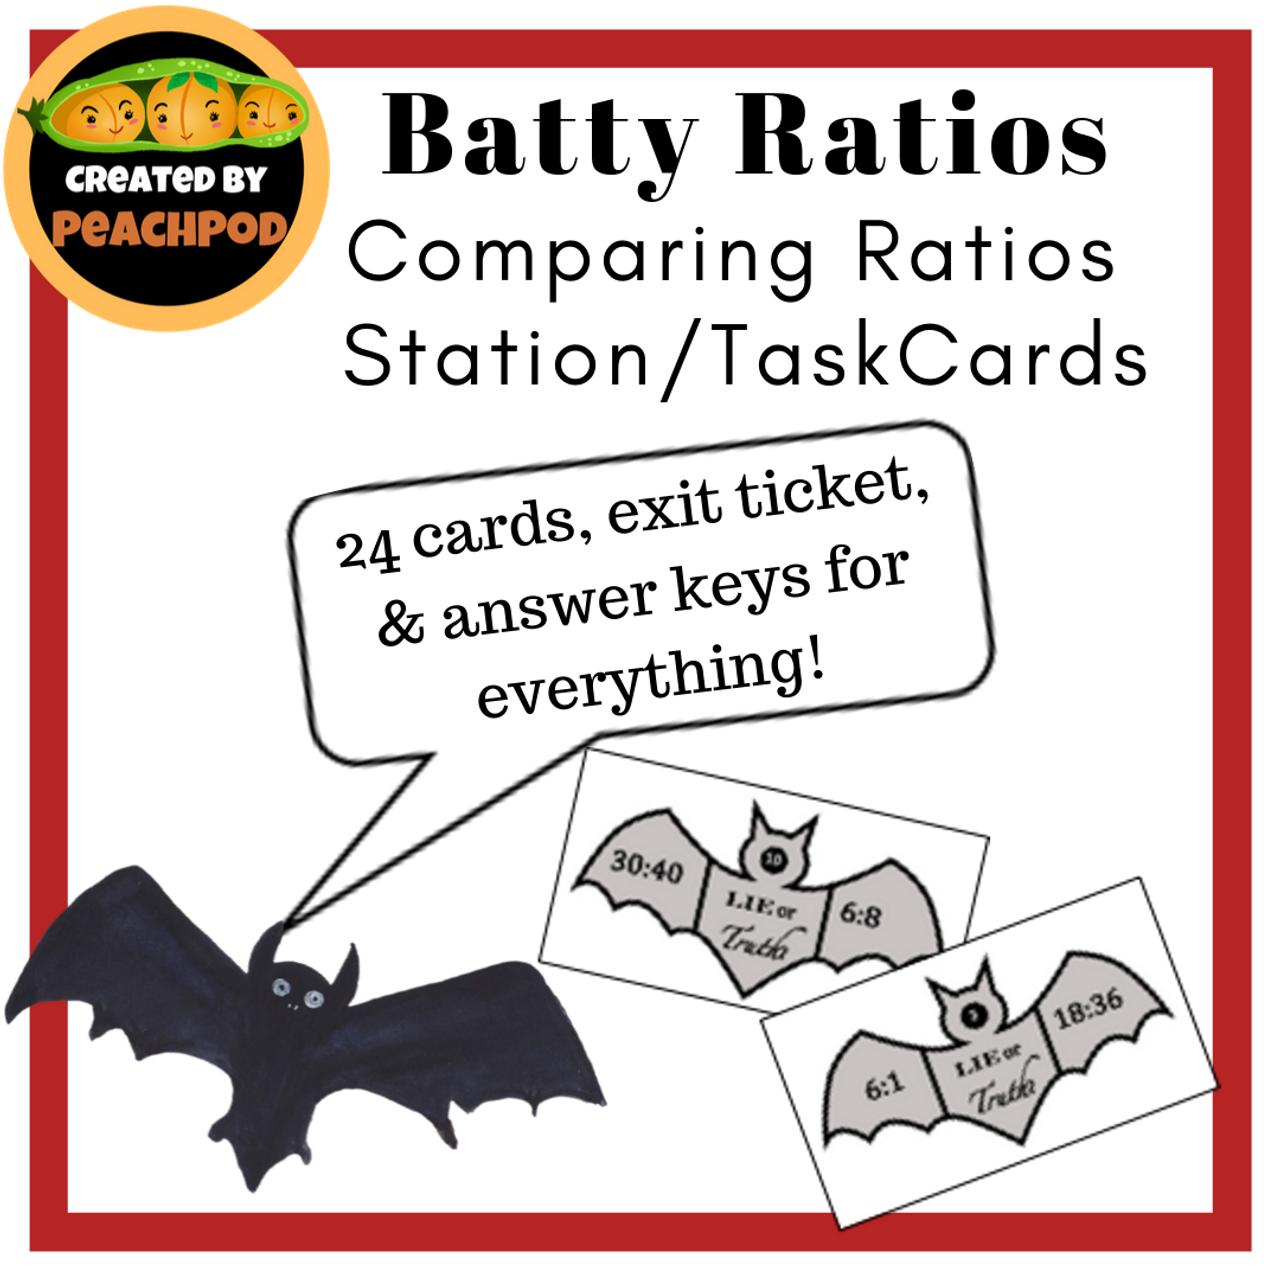 Batty Ratios: Comparing Ratios Station/Task Cards